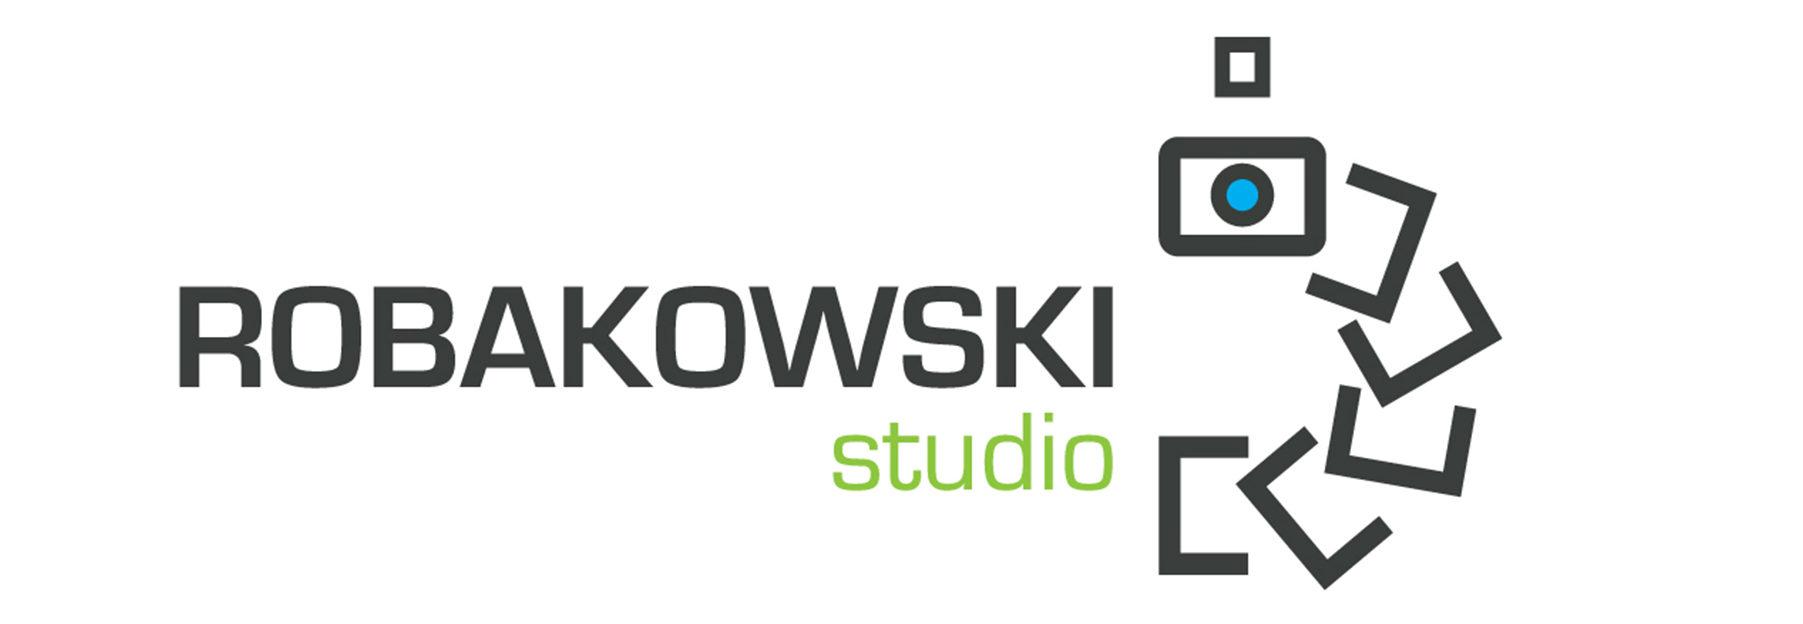 Robakowski Studio